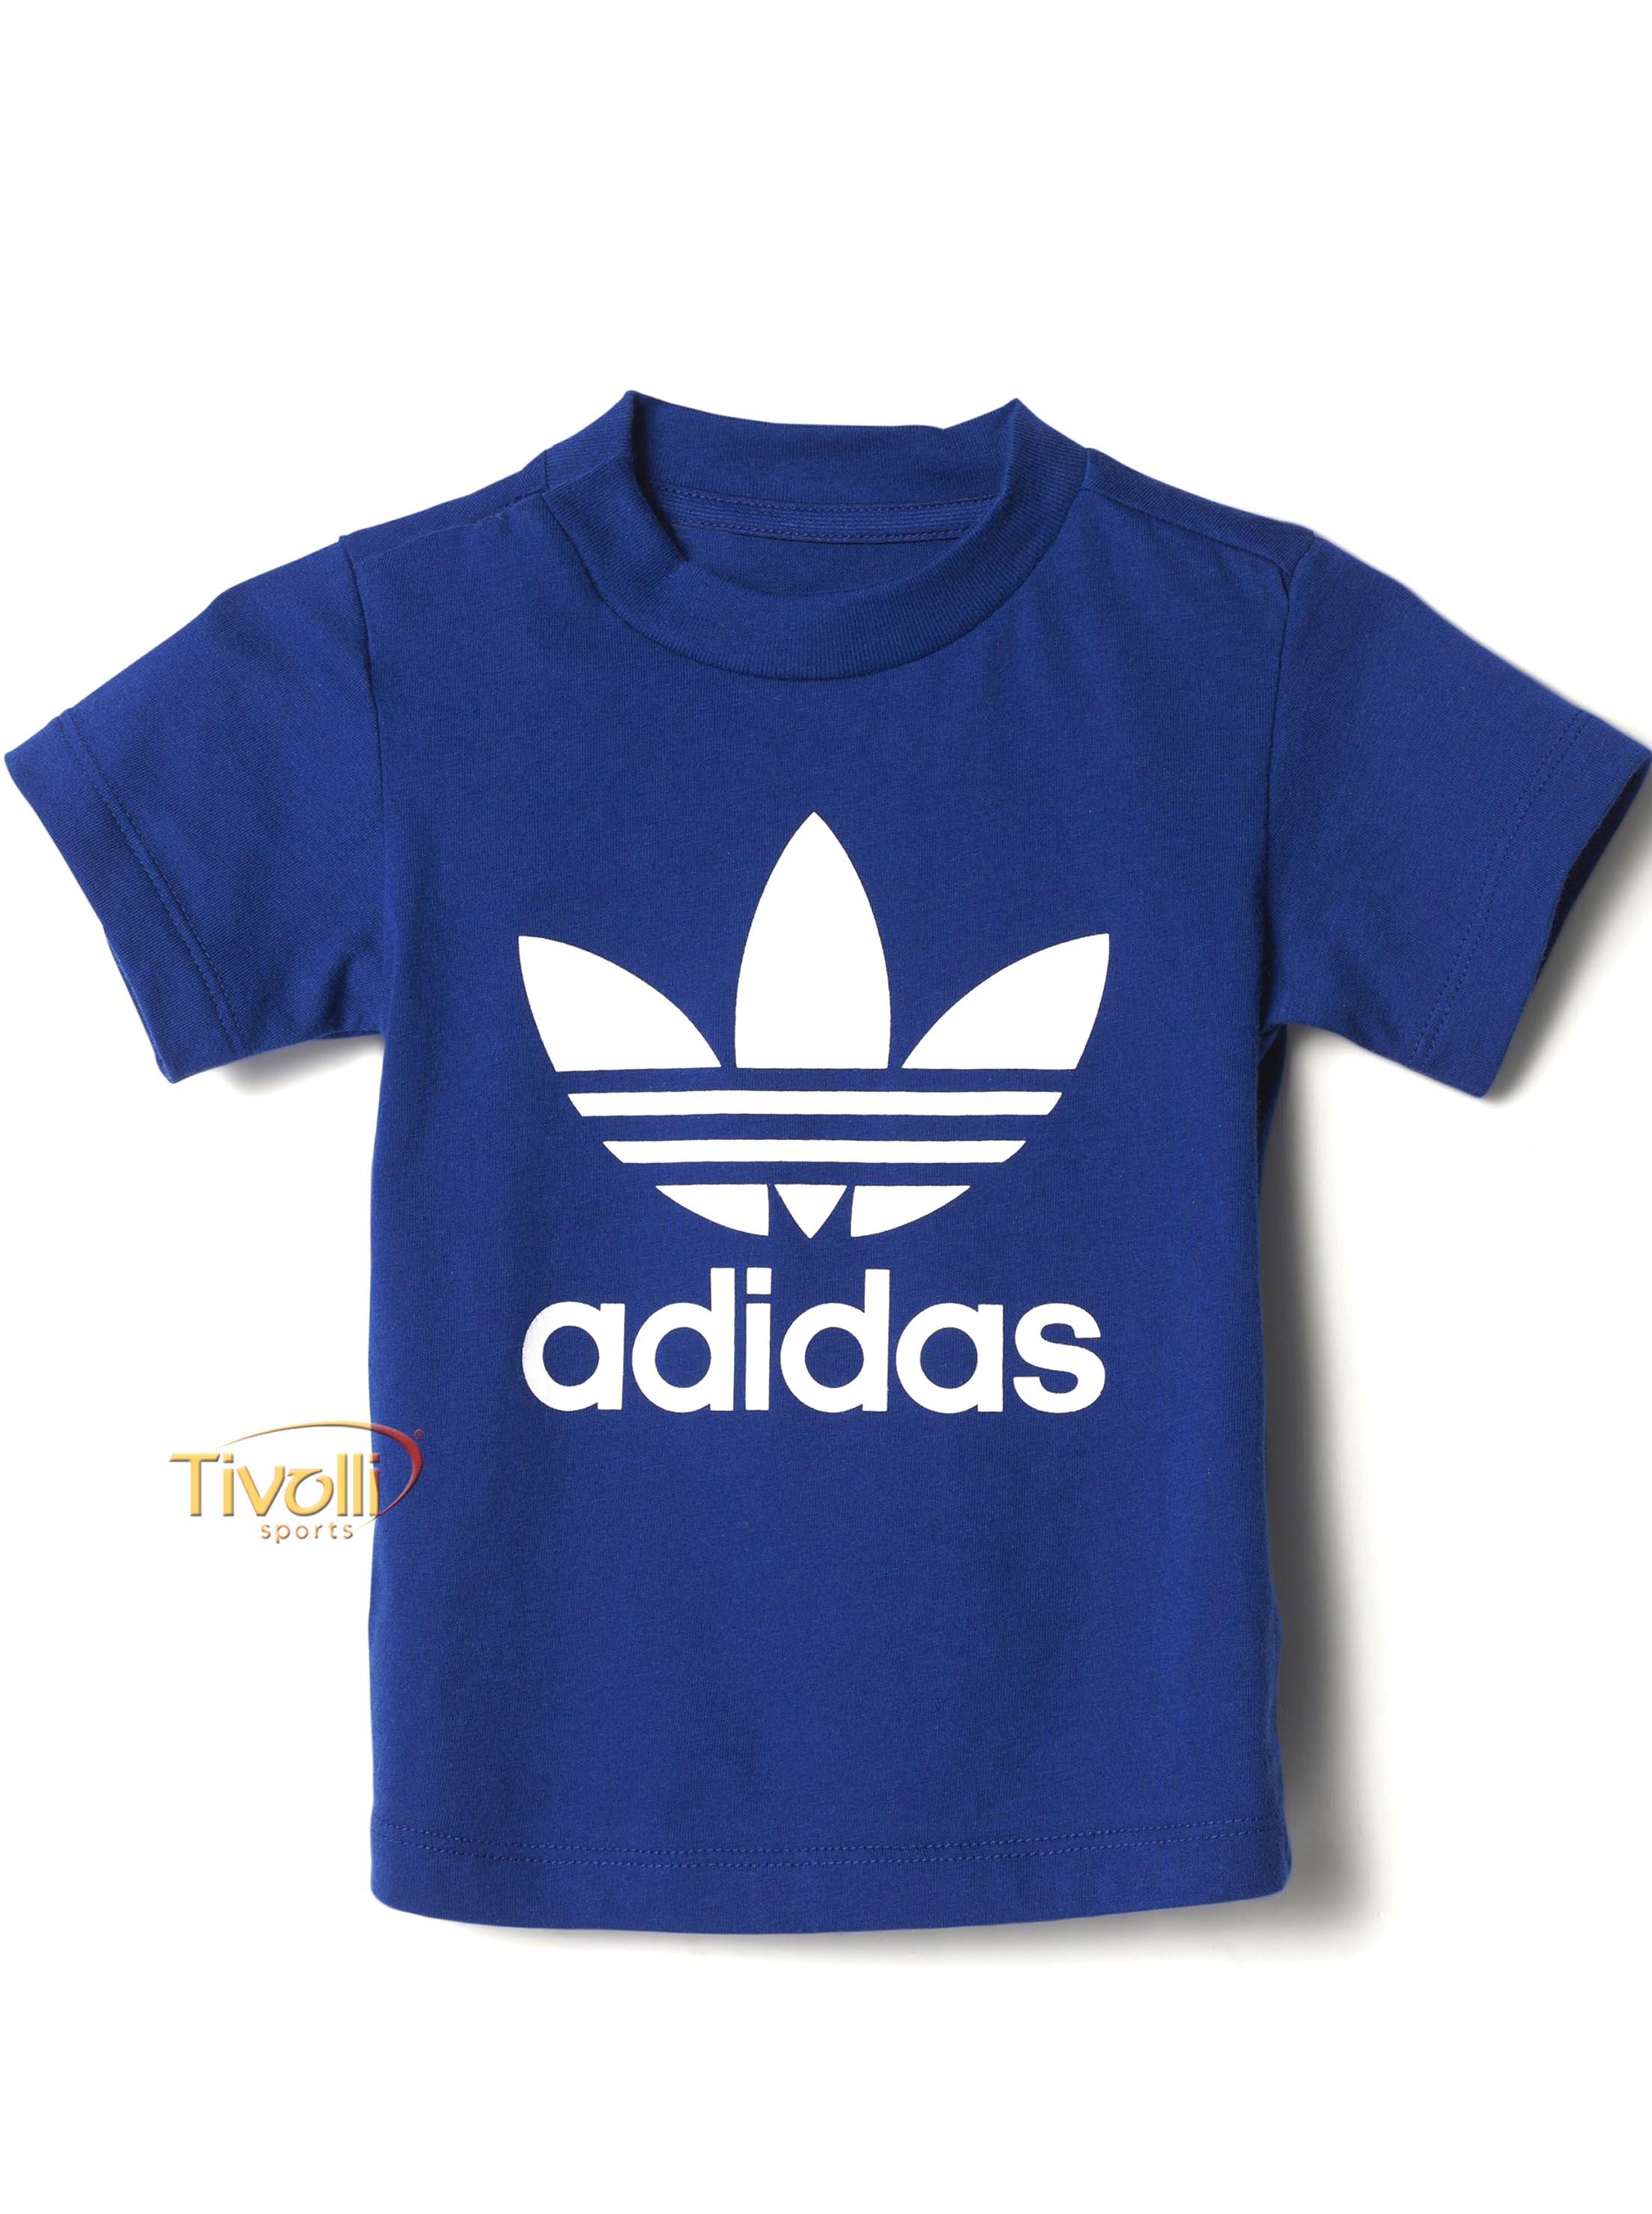 d37b7915c5 Camiseta Adidas Trefoil Infantil   Azul